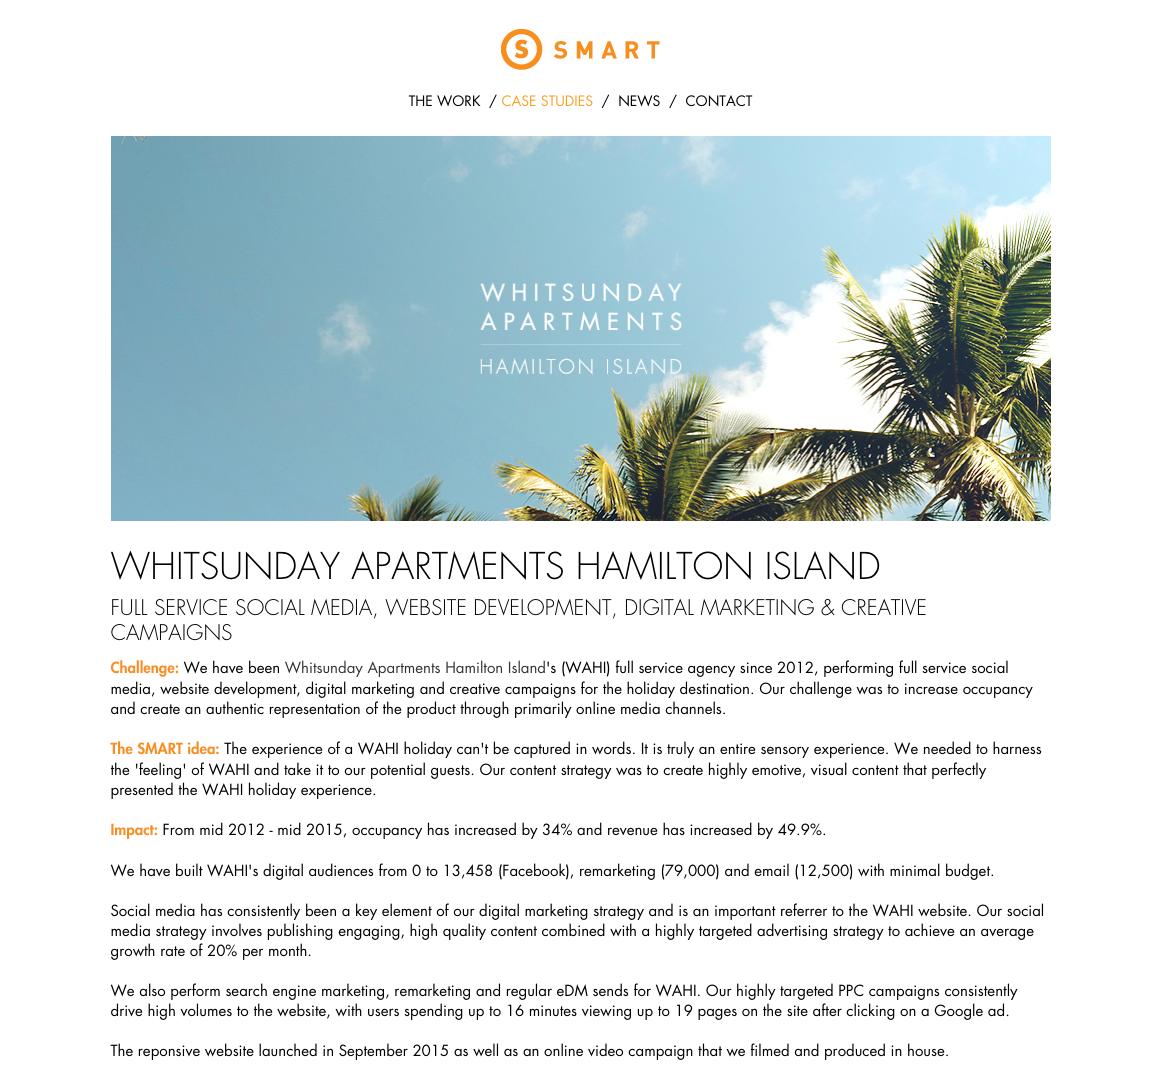 Whitsunday_Apartments_Hamilton_Island_Social_Media_Website_Development_Campaigns